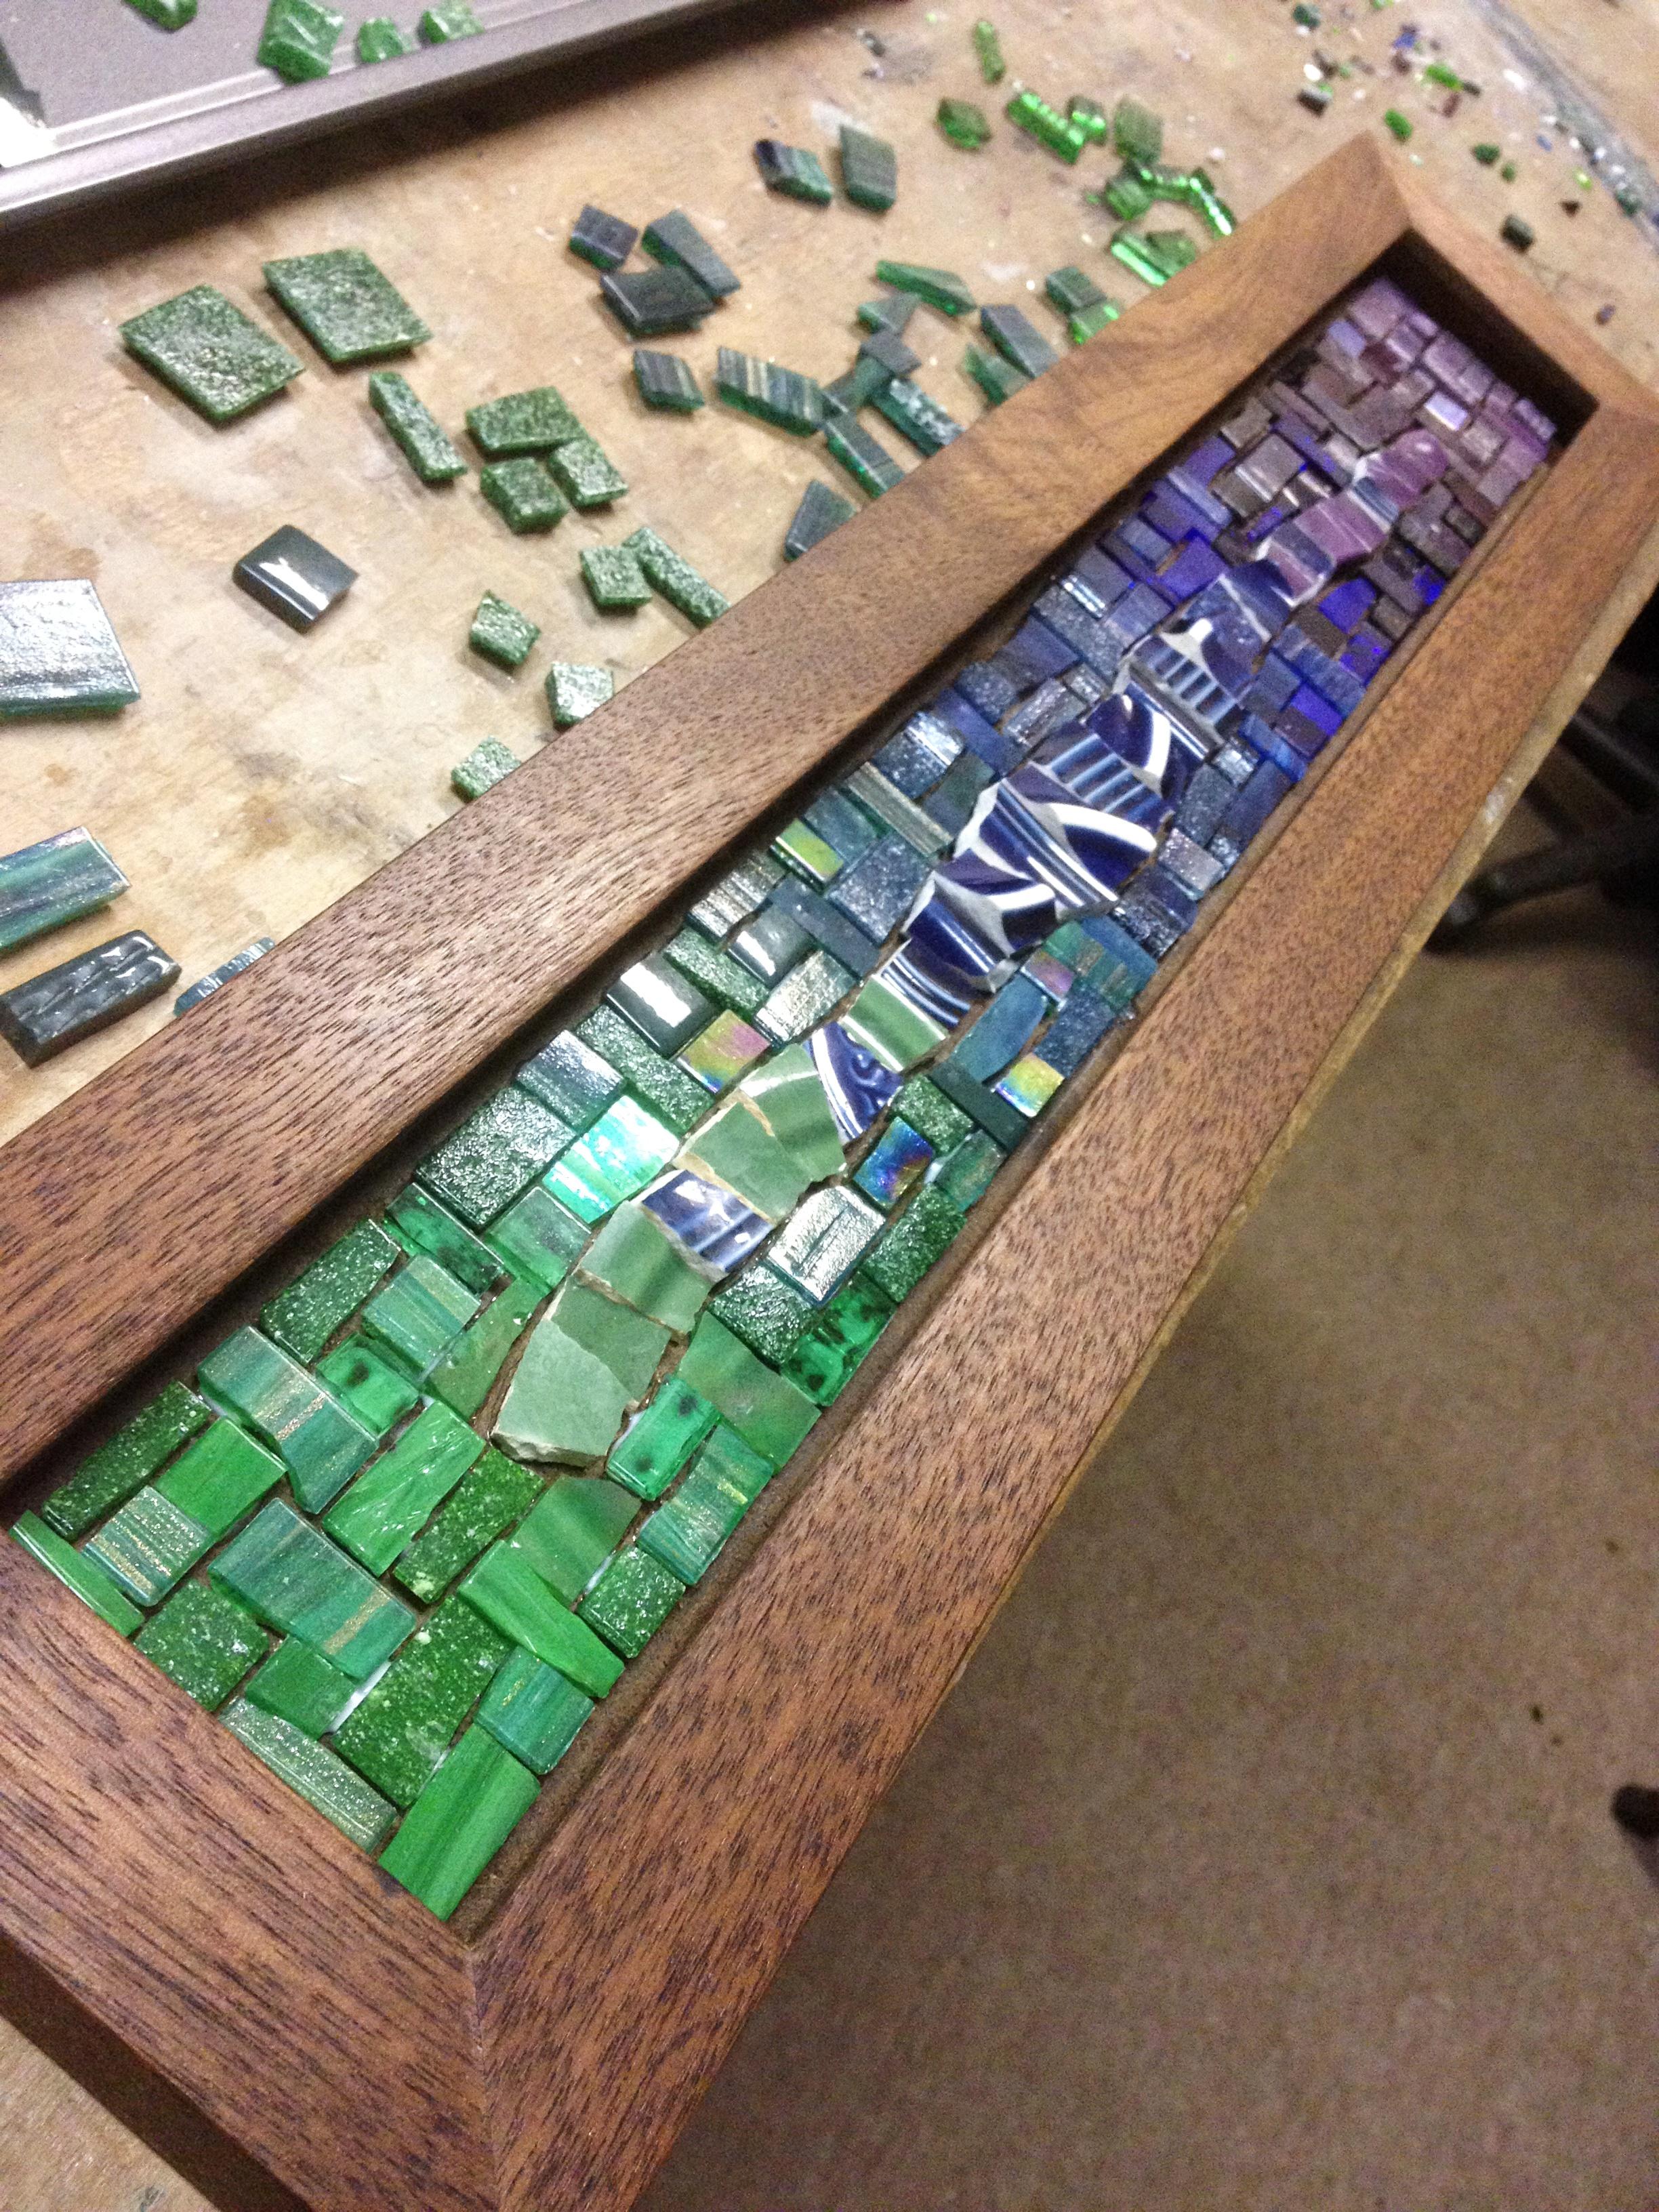 Cool colors mosaic coat rack in progress